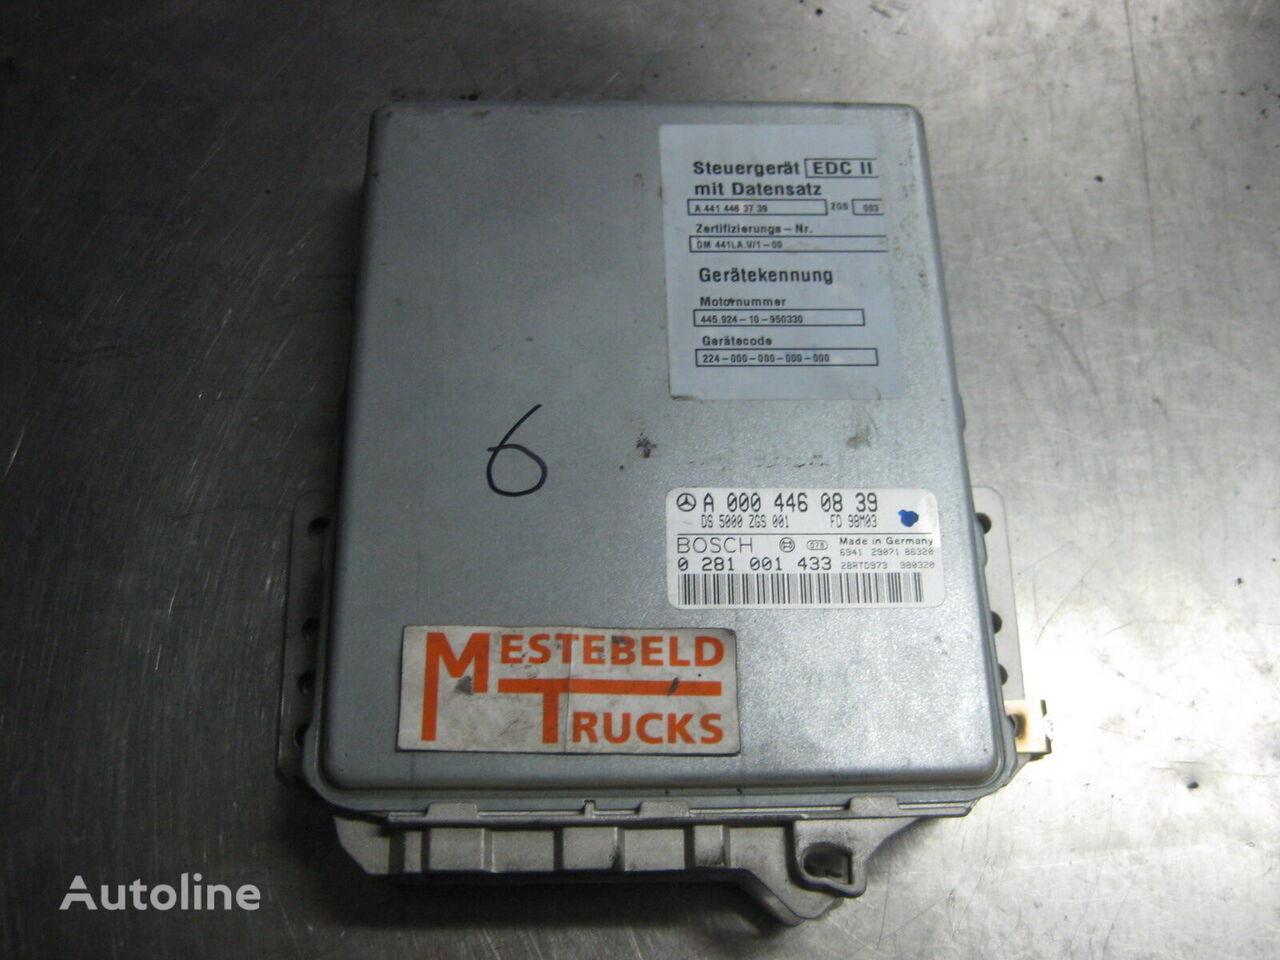 ordenador de abordo MERCEDES-BENZ Stuurkast SK para camión MERCEDES-BENZ